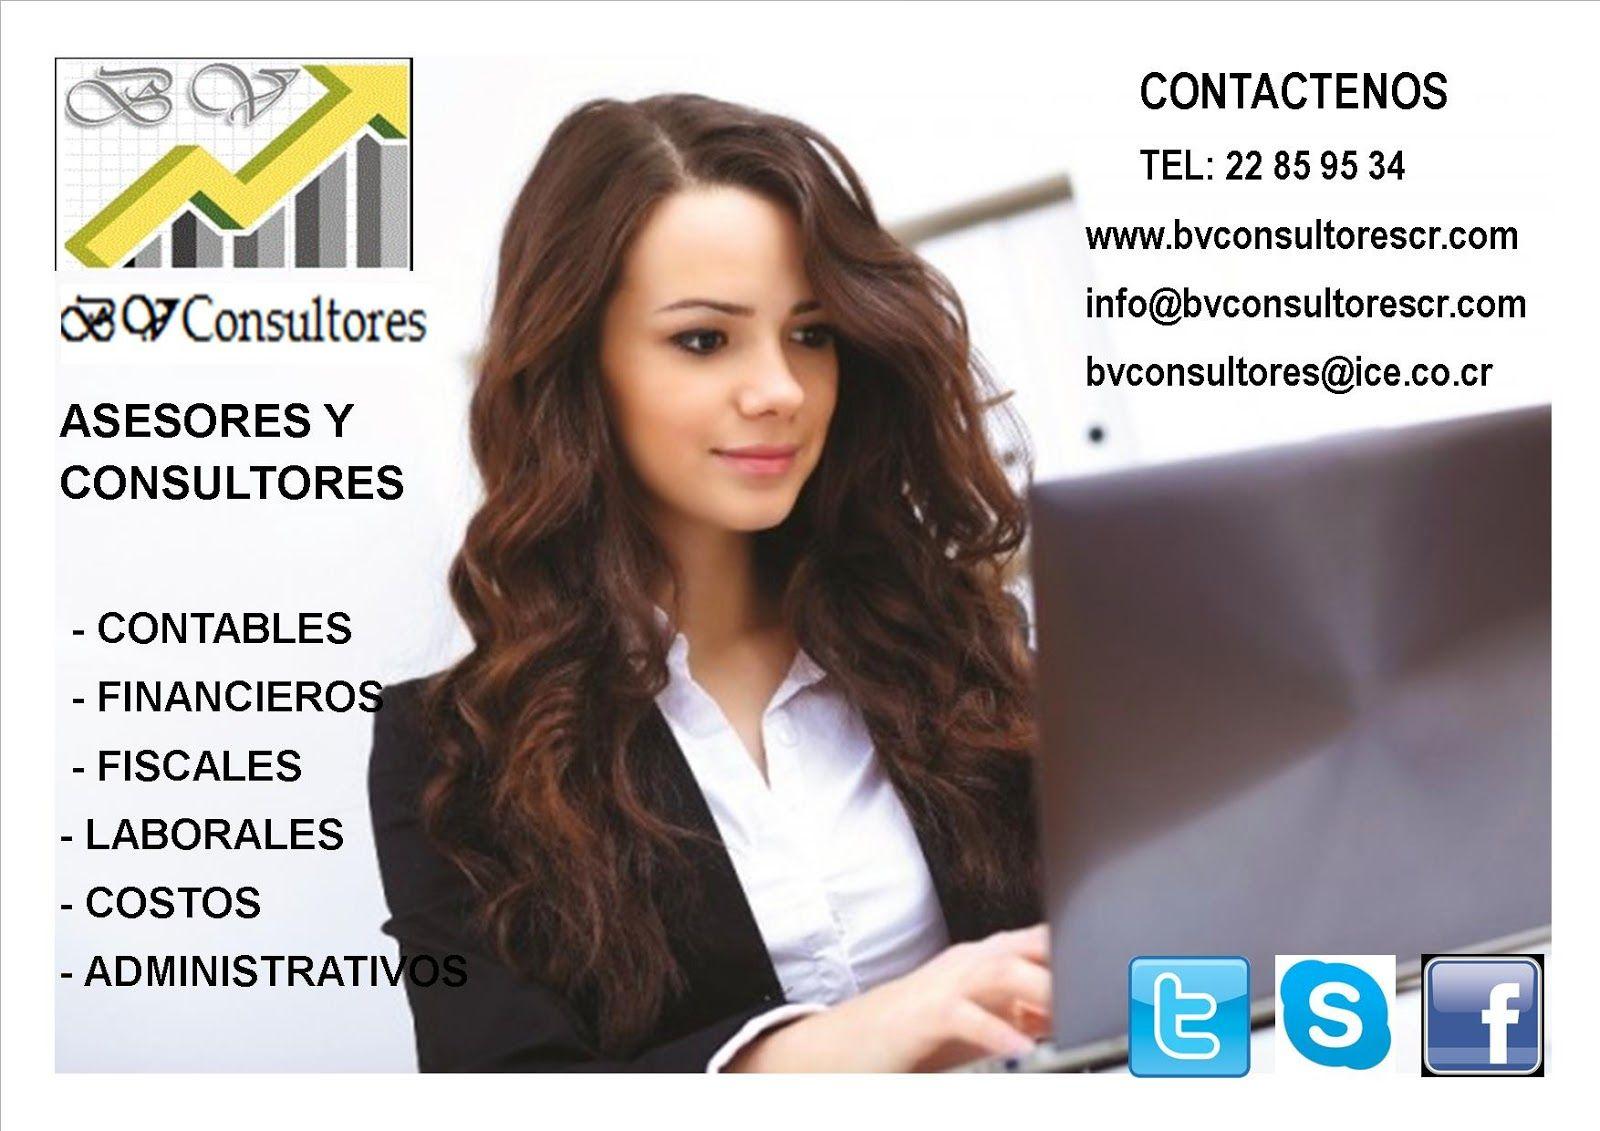 BV Consultores Costa Rica: